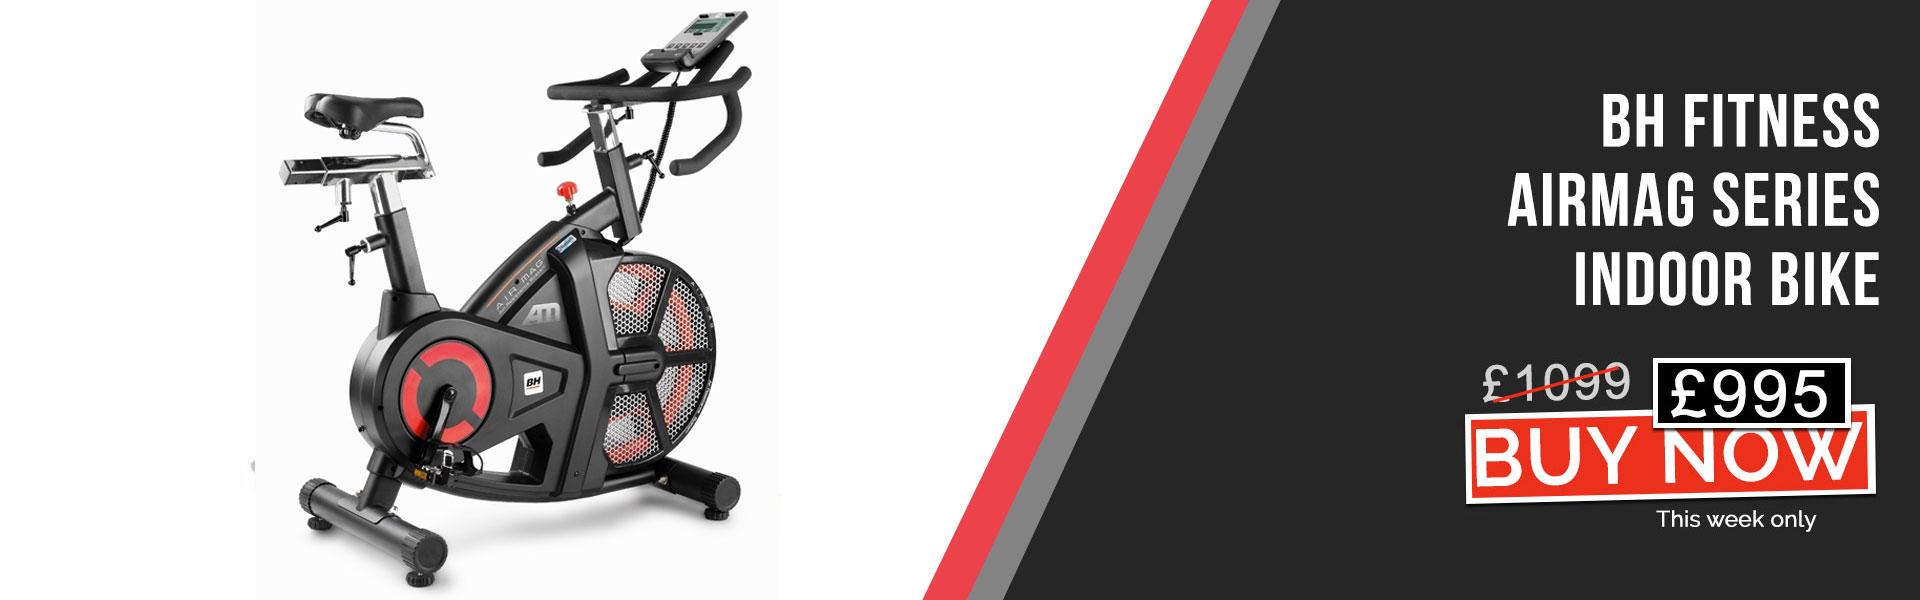 BH Fitness Airmag Indoor Bike